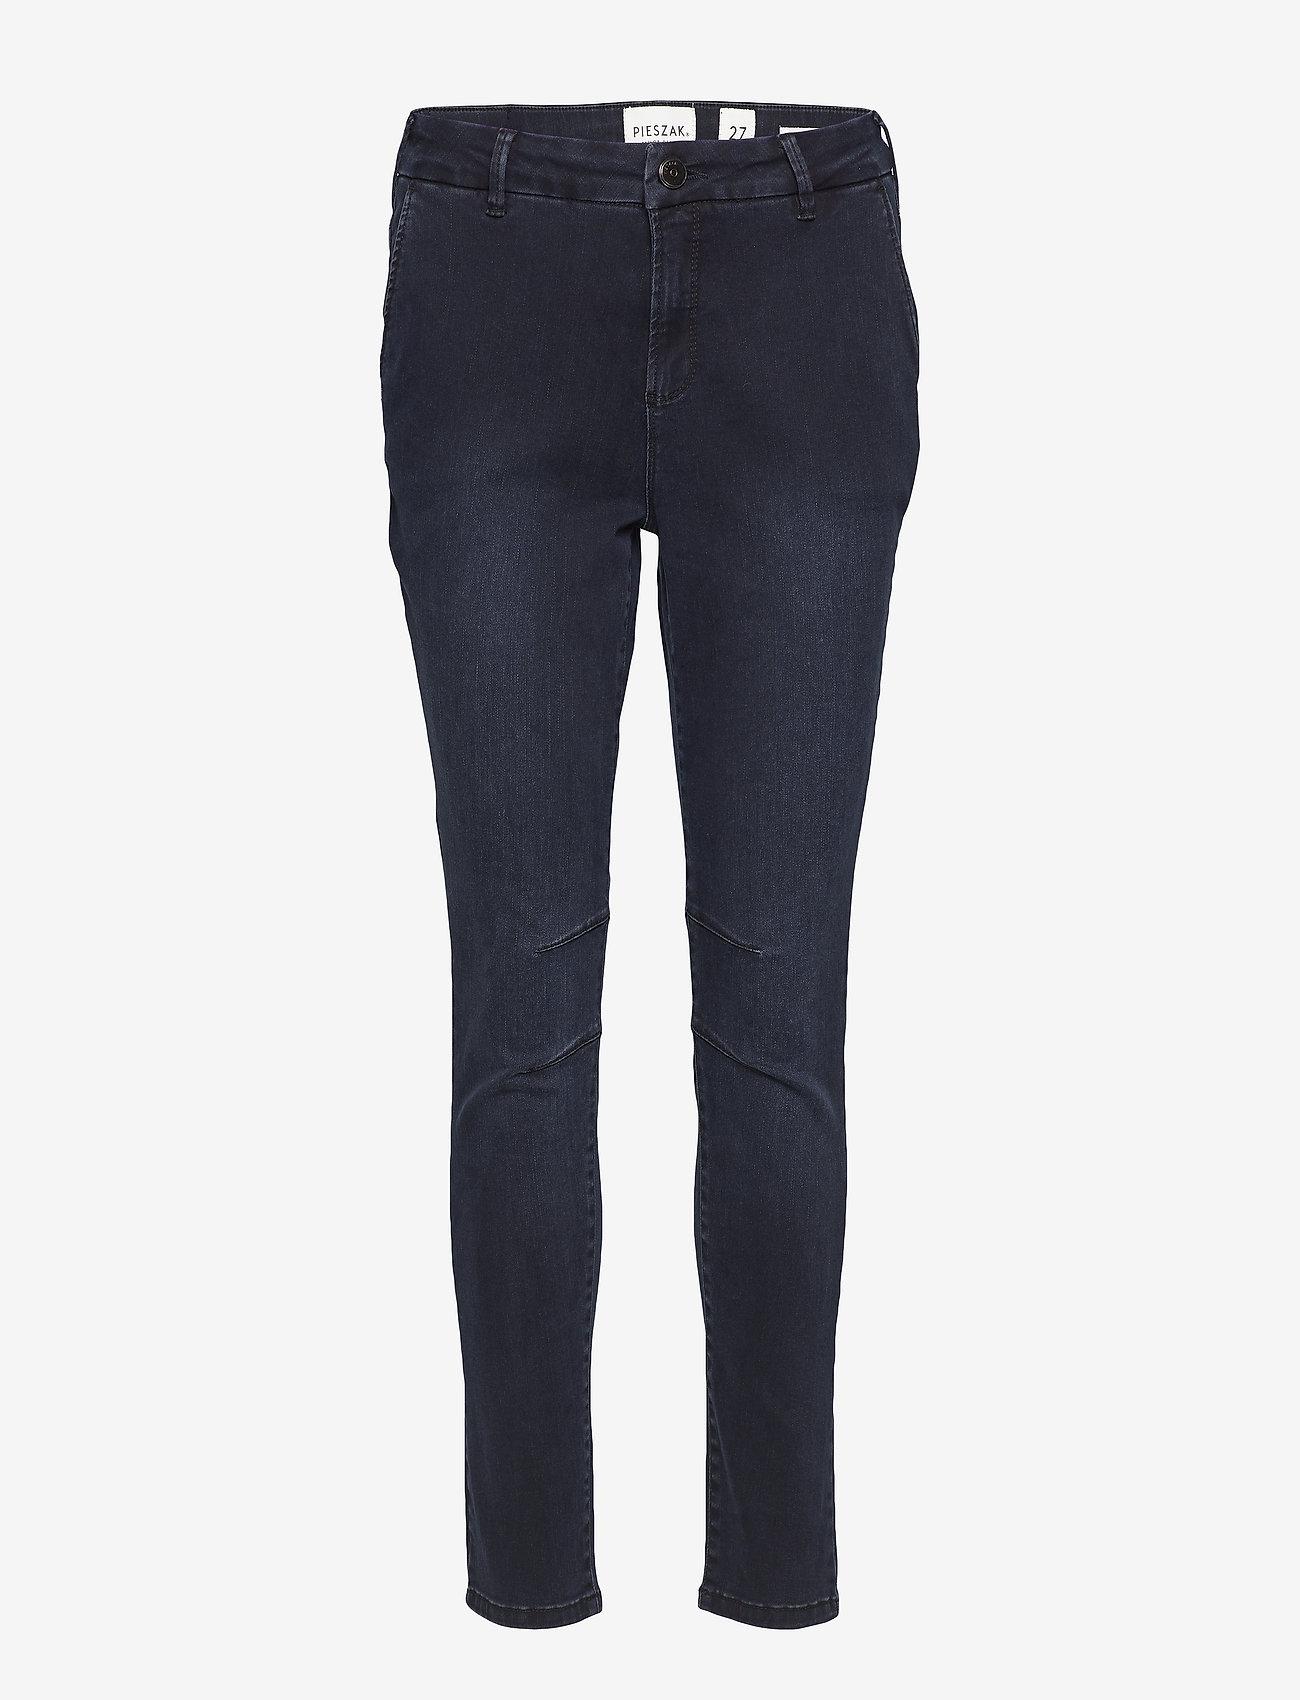 Pieszak - Kenya jeans wash Oakland - slim jeans - denim blue